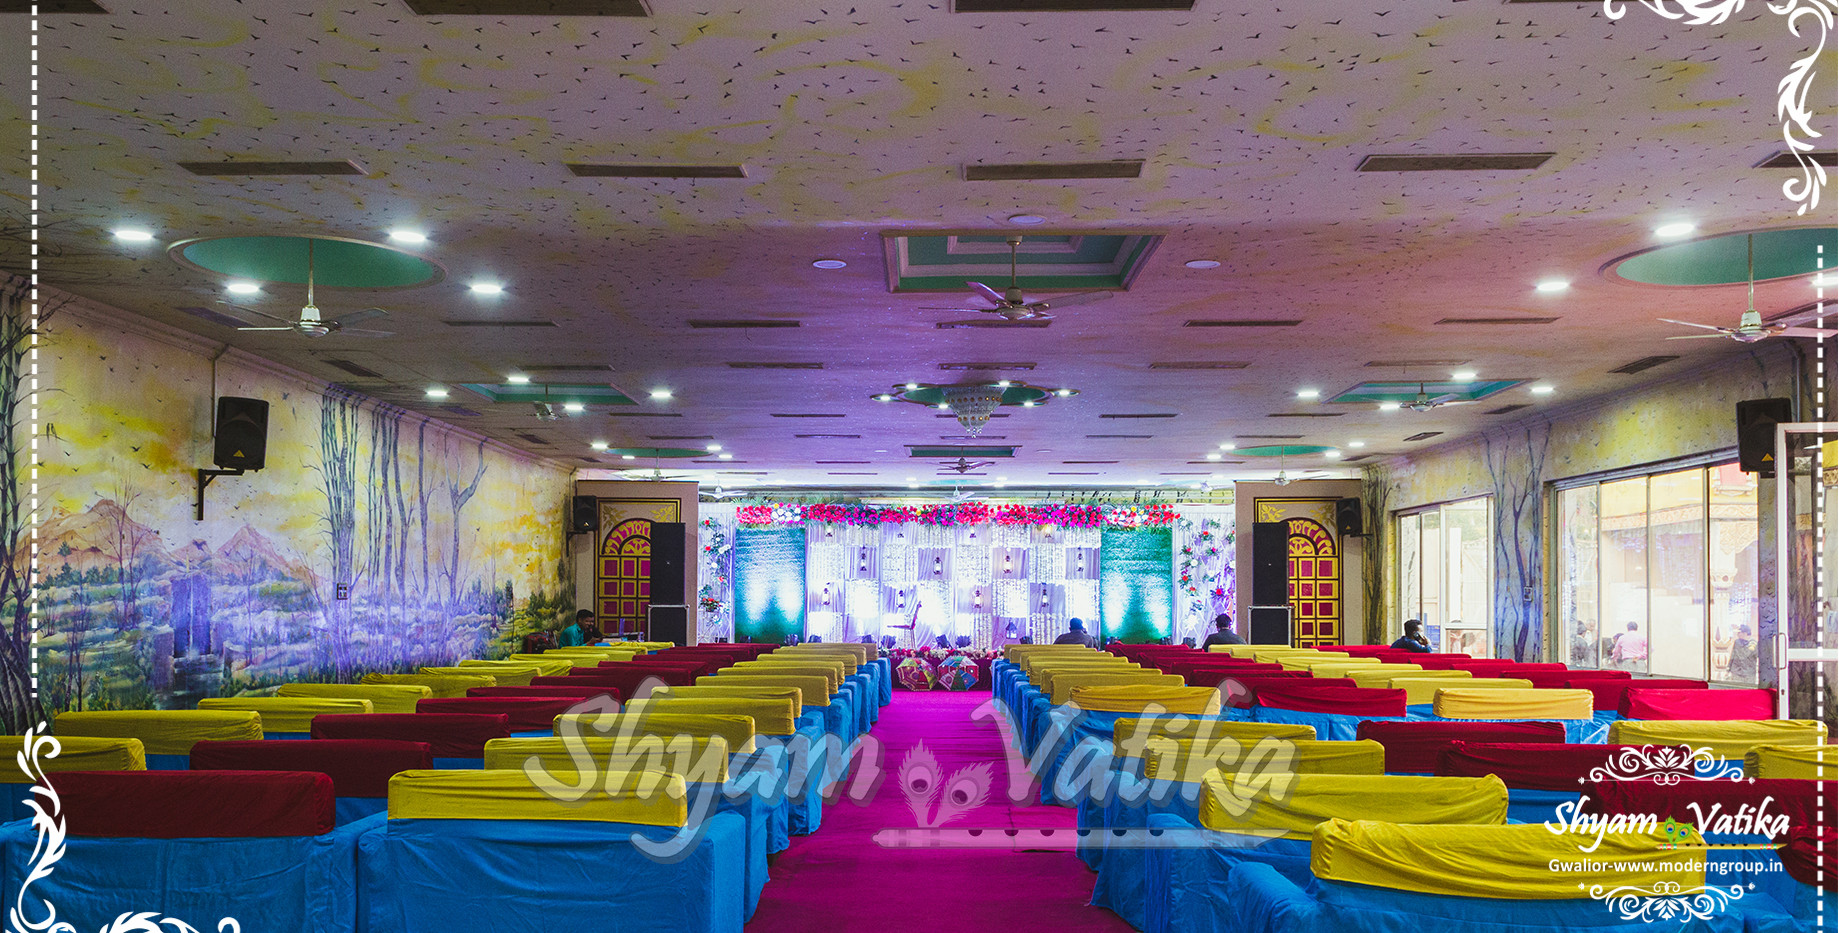 Shyam Vatika Gwalior 02.jpg